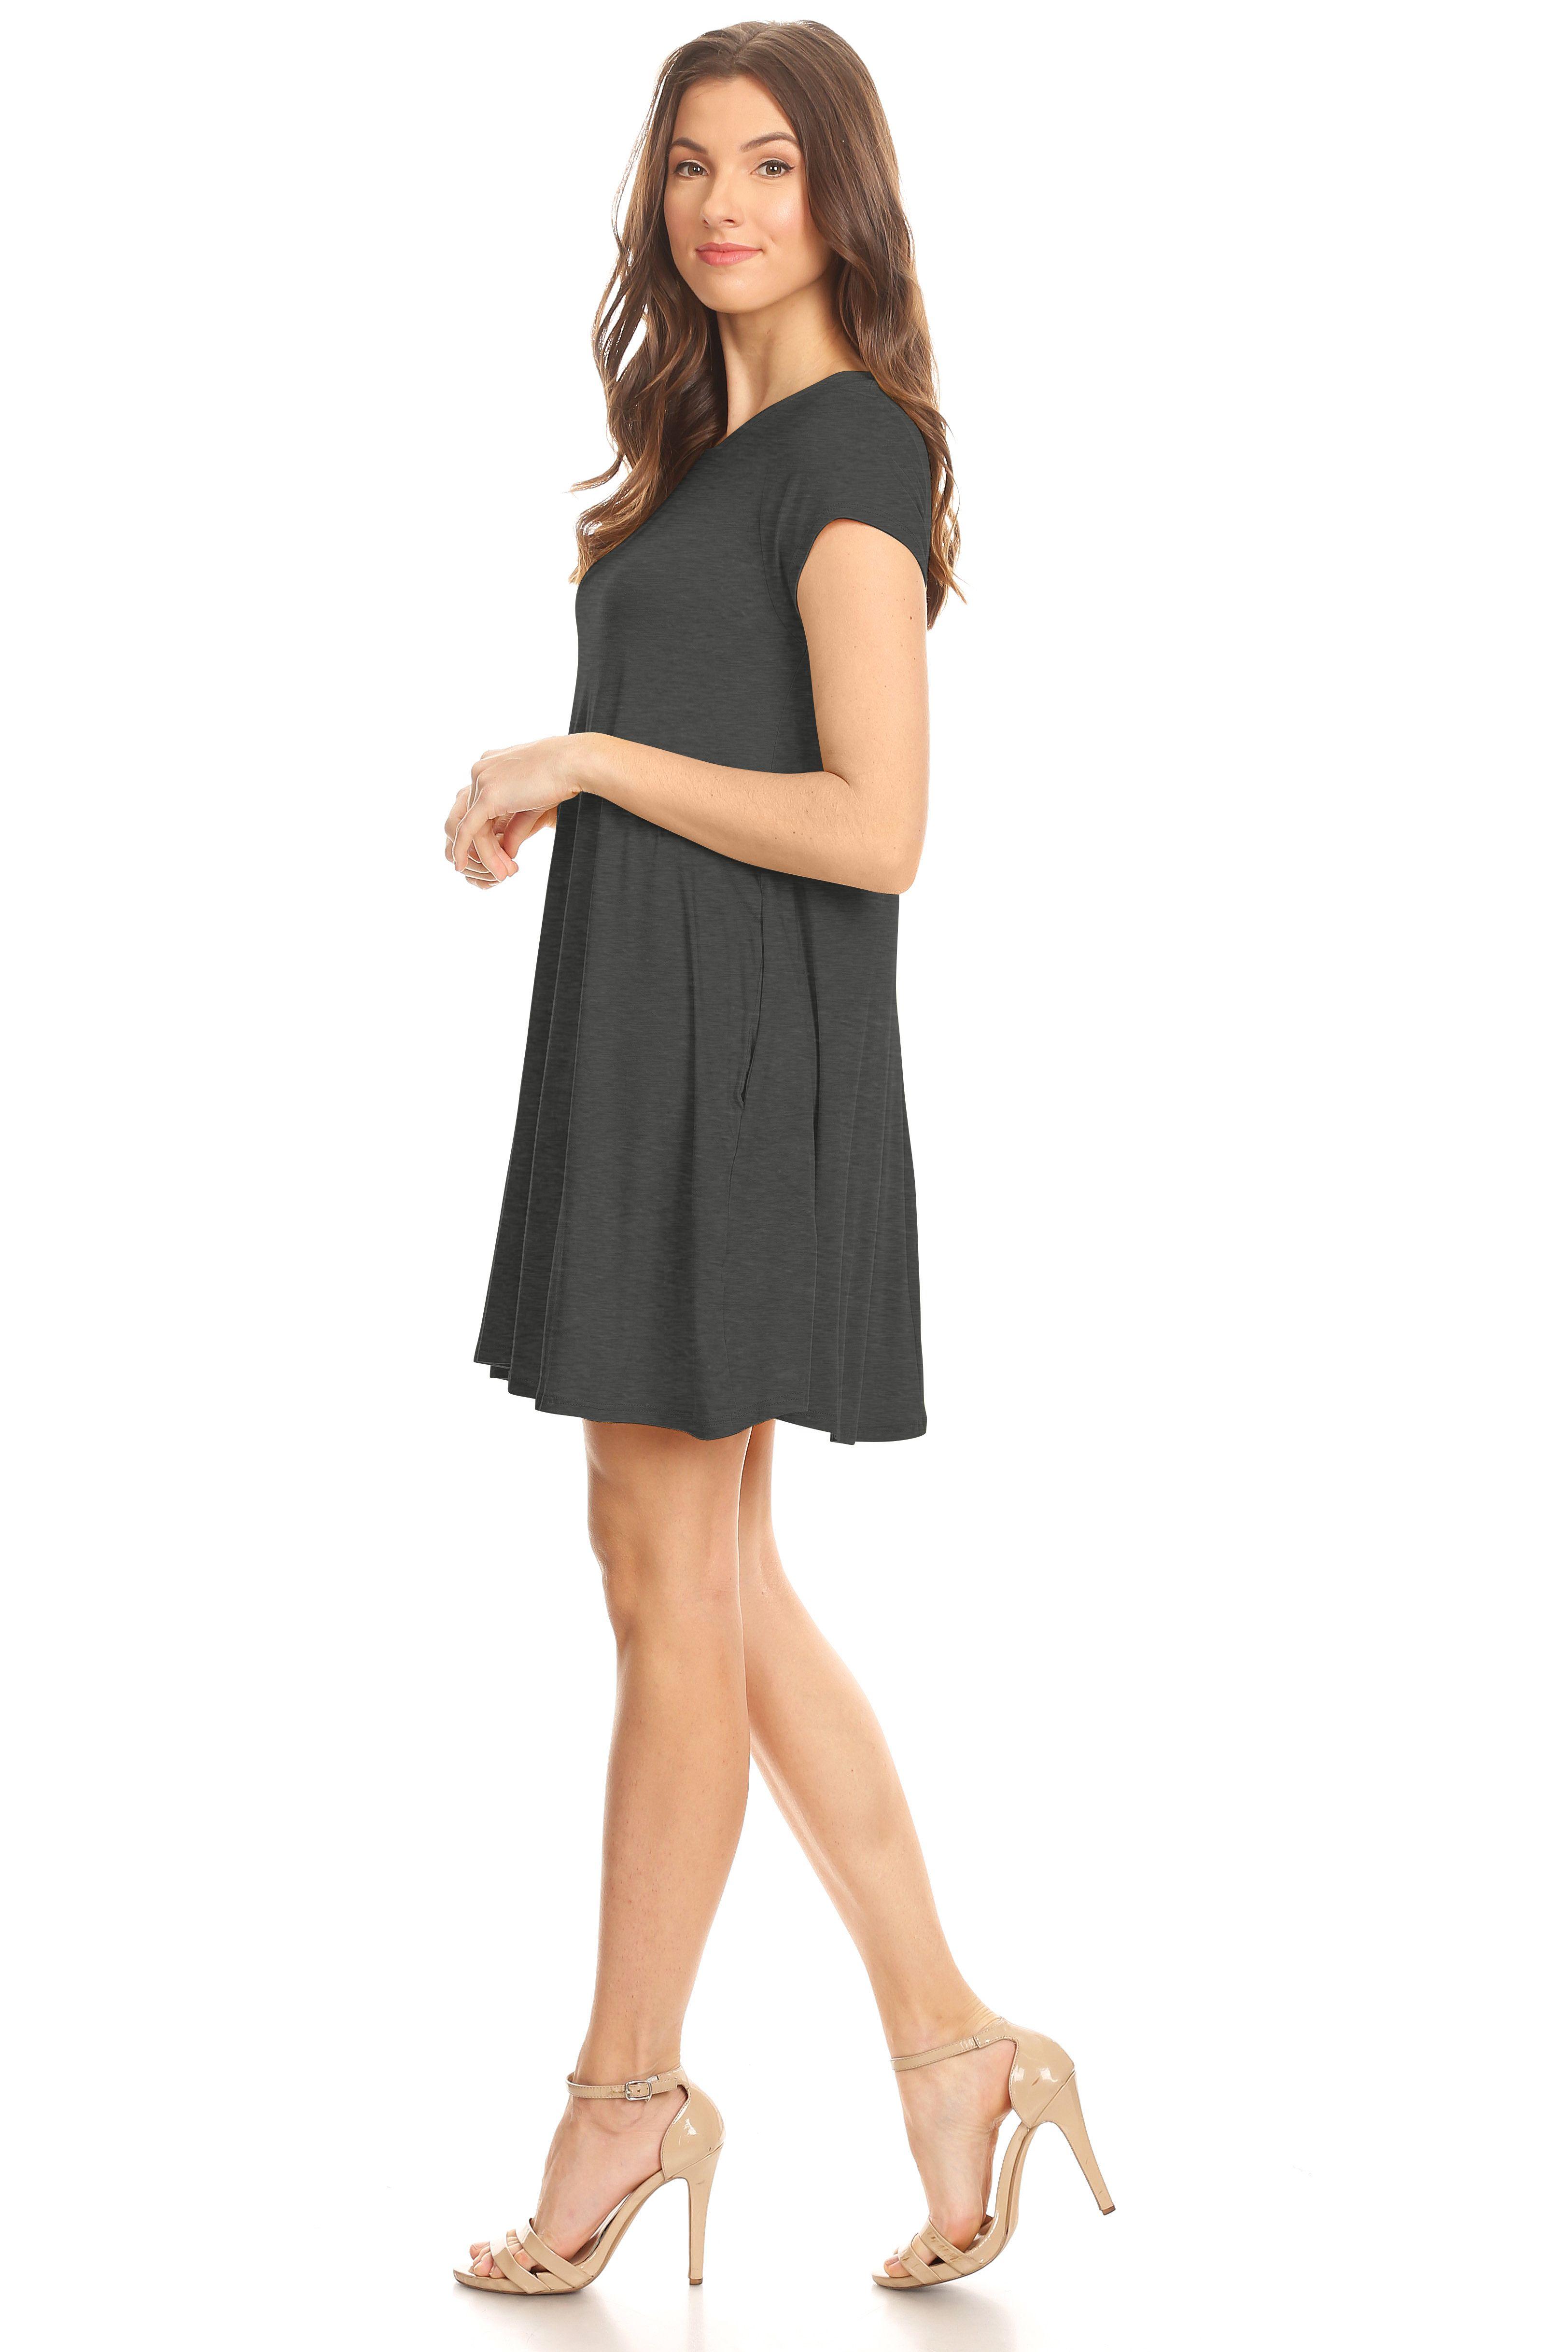 9bfd1959a30 Womens Casual Short Sleeve T Shirt Dress Flowy Tunic Dress with Pockets -  USA Sleeve